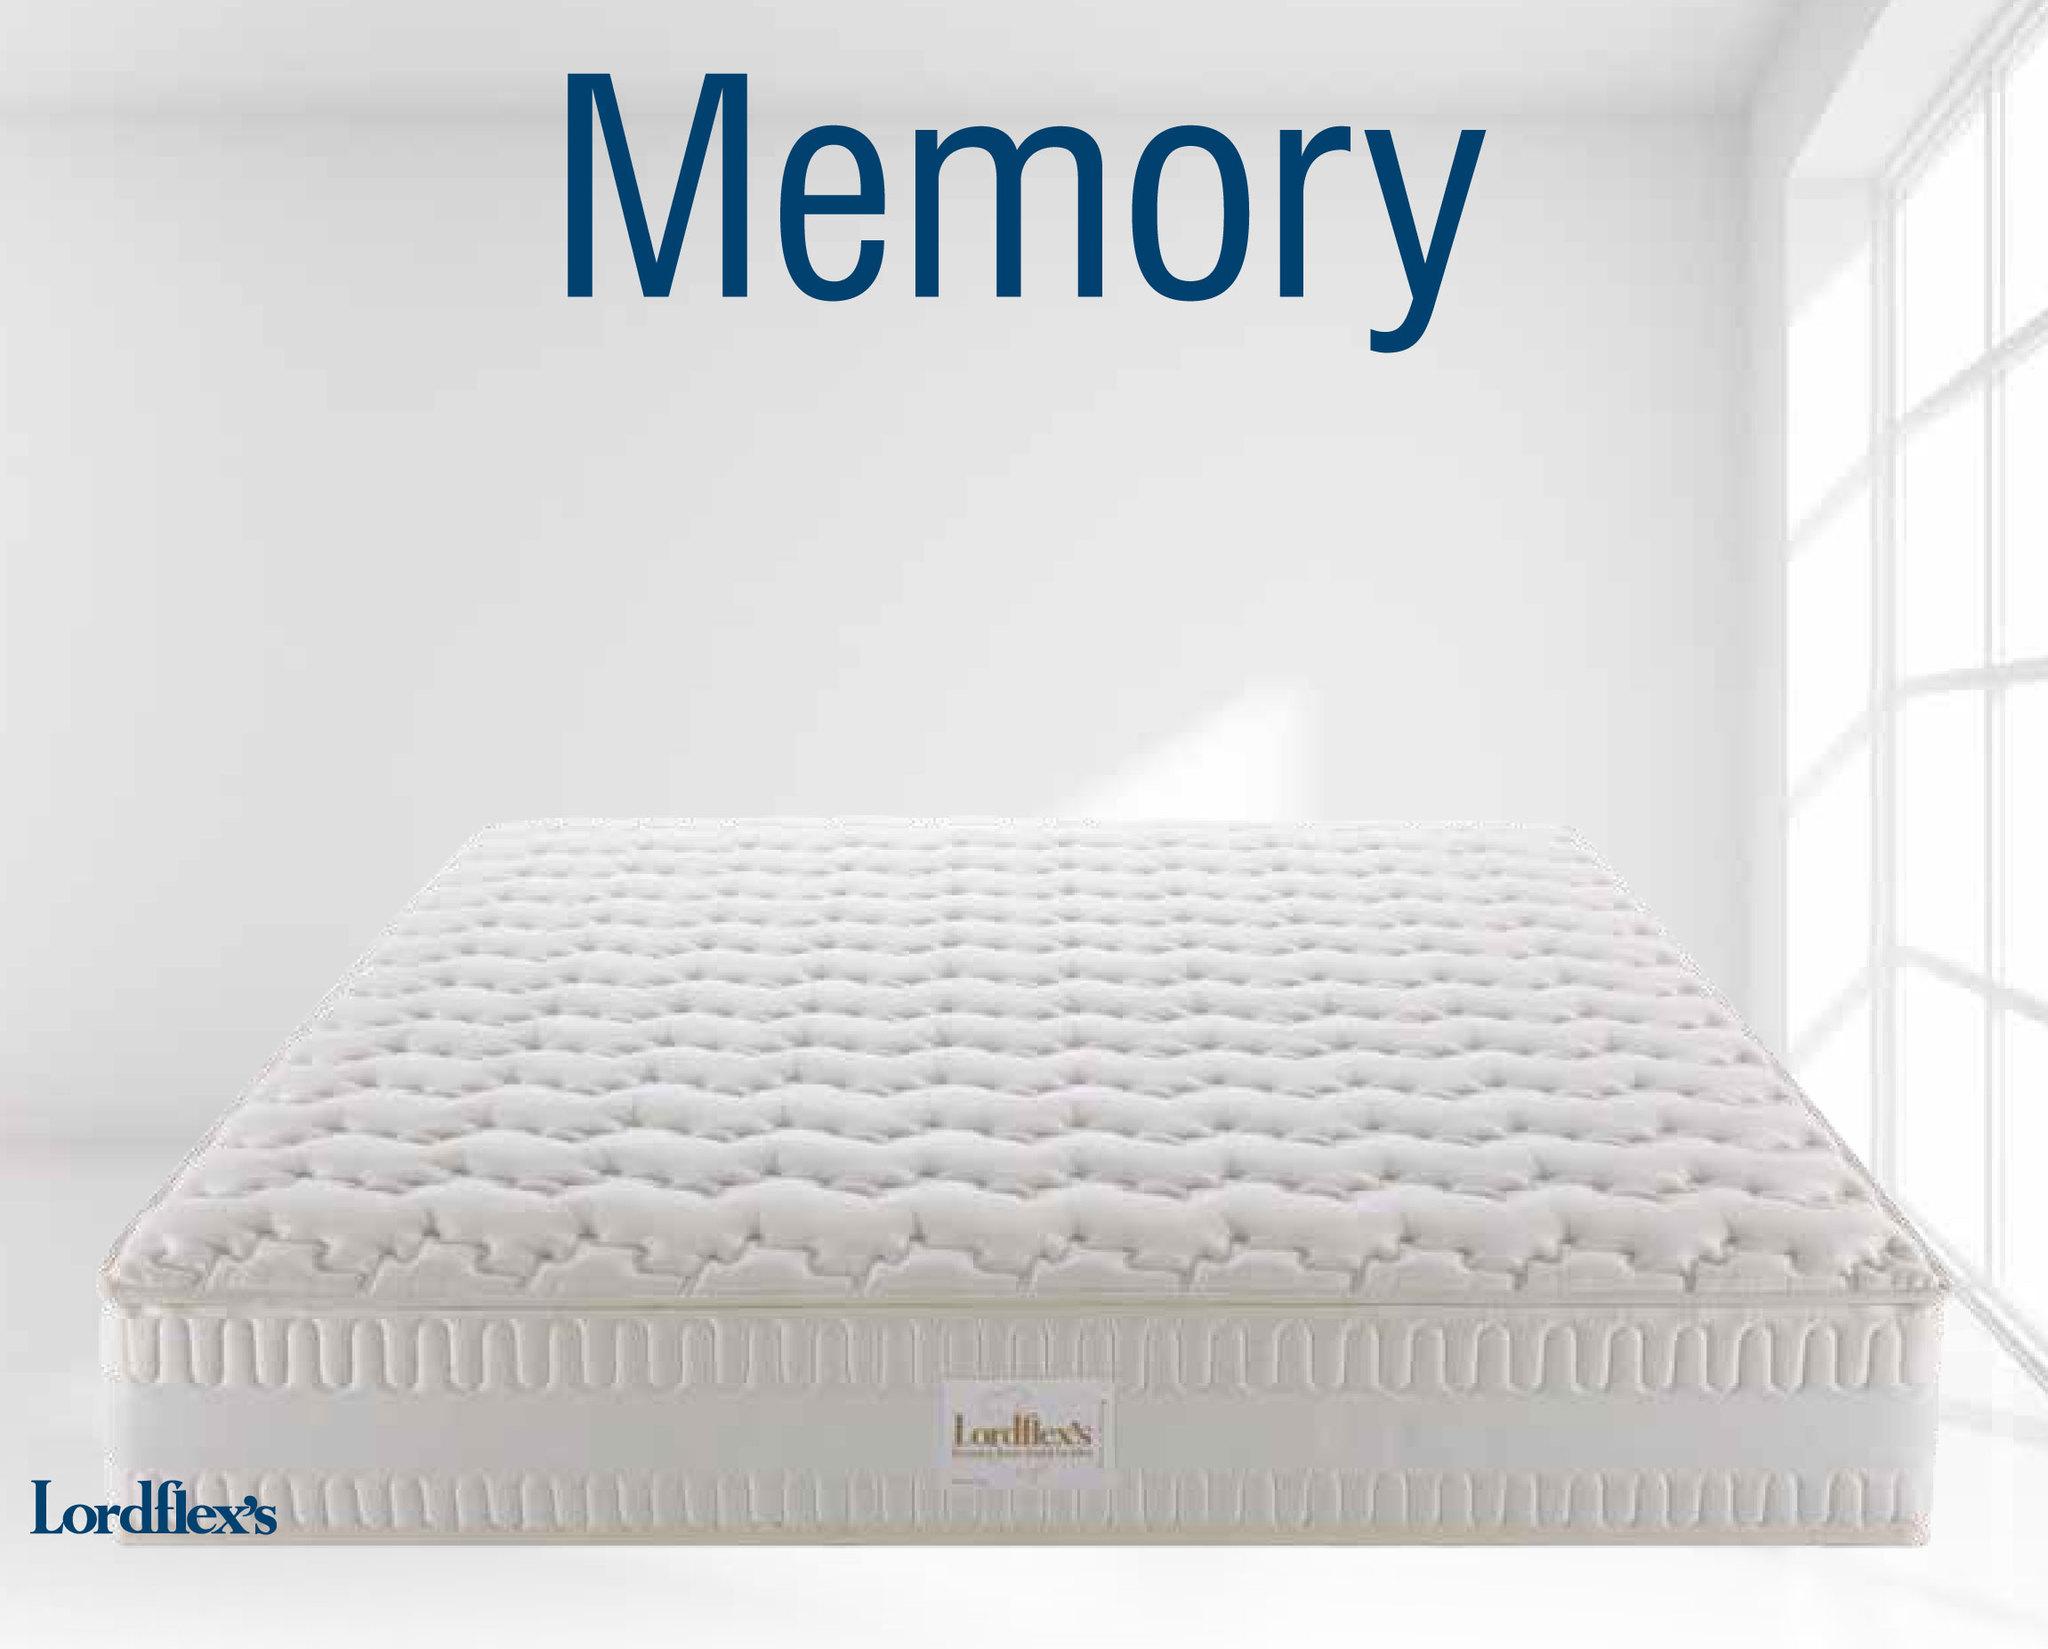 Матрасы Матрас ортопедический Lordflex's Memory 160х200 до 140 кг Memory.jpg